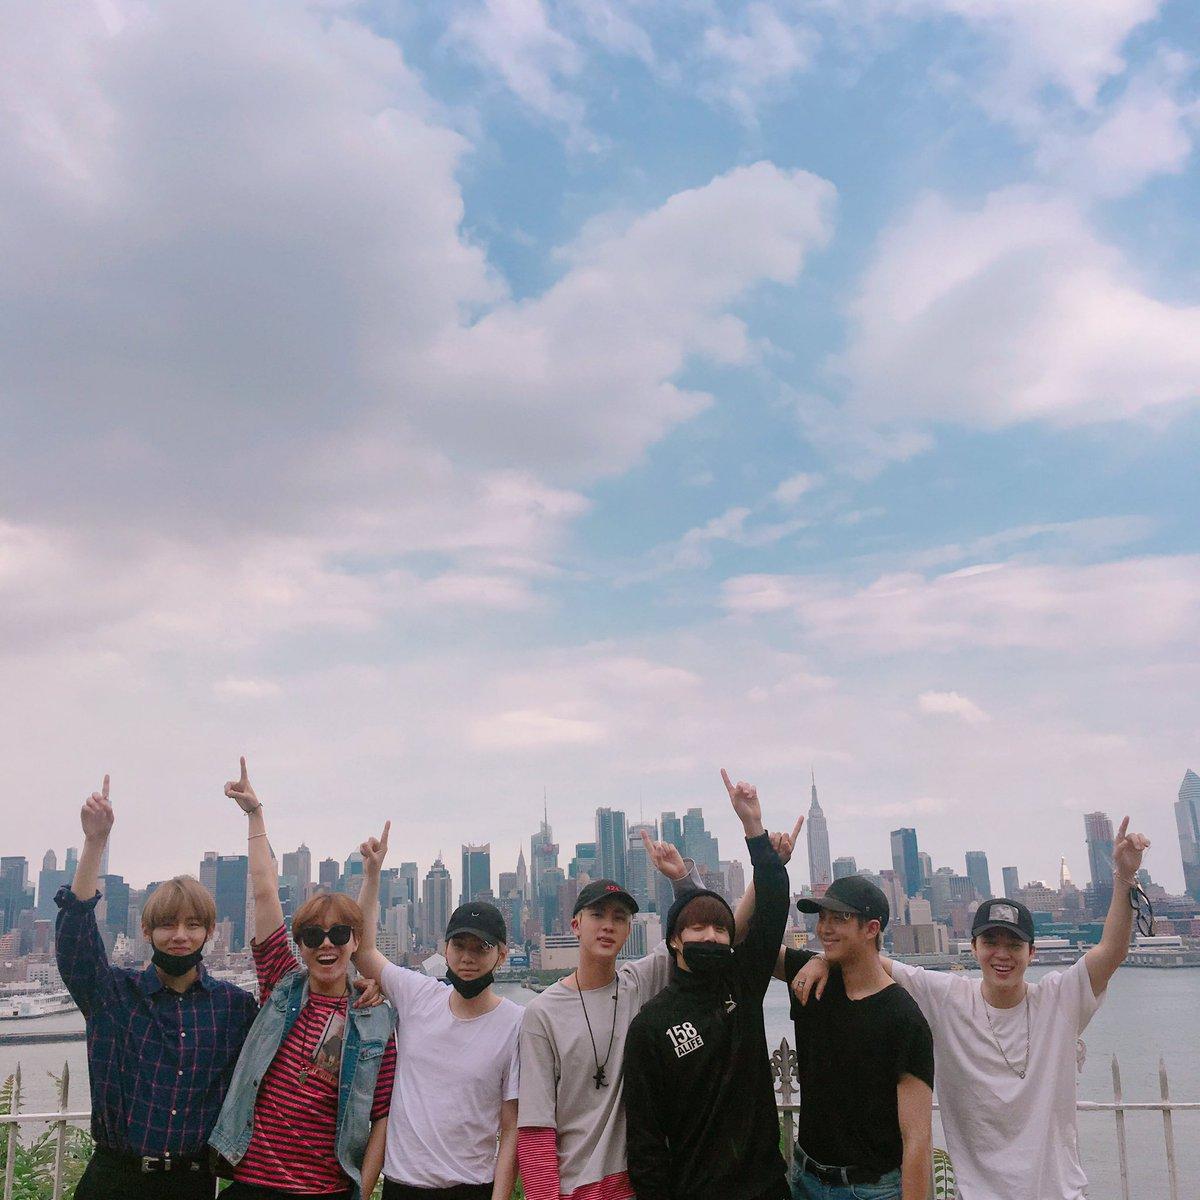 BTS Group Photo 2016 BTS Photo 39724613 Fanpop